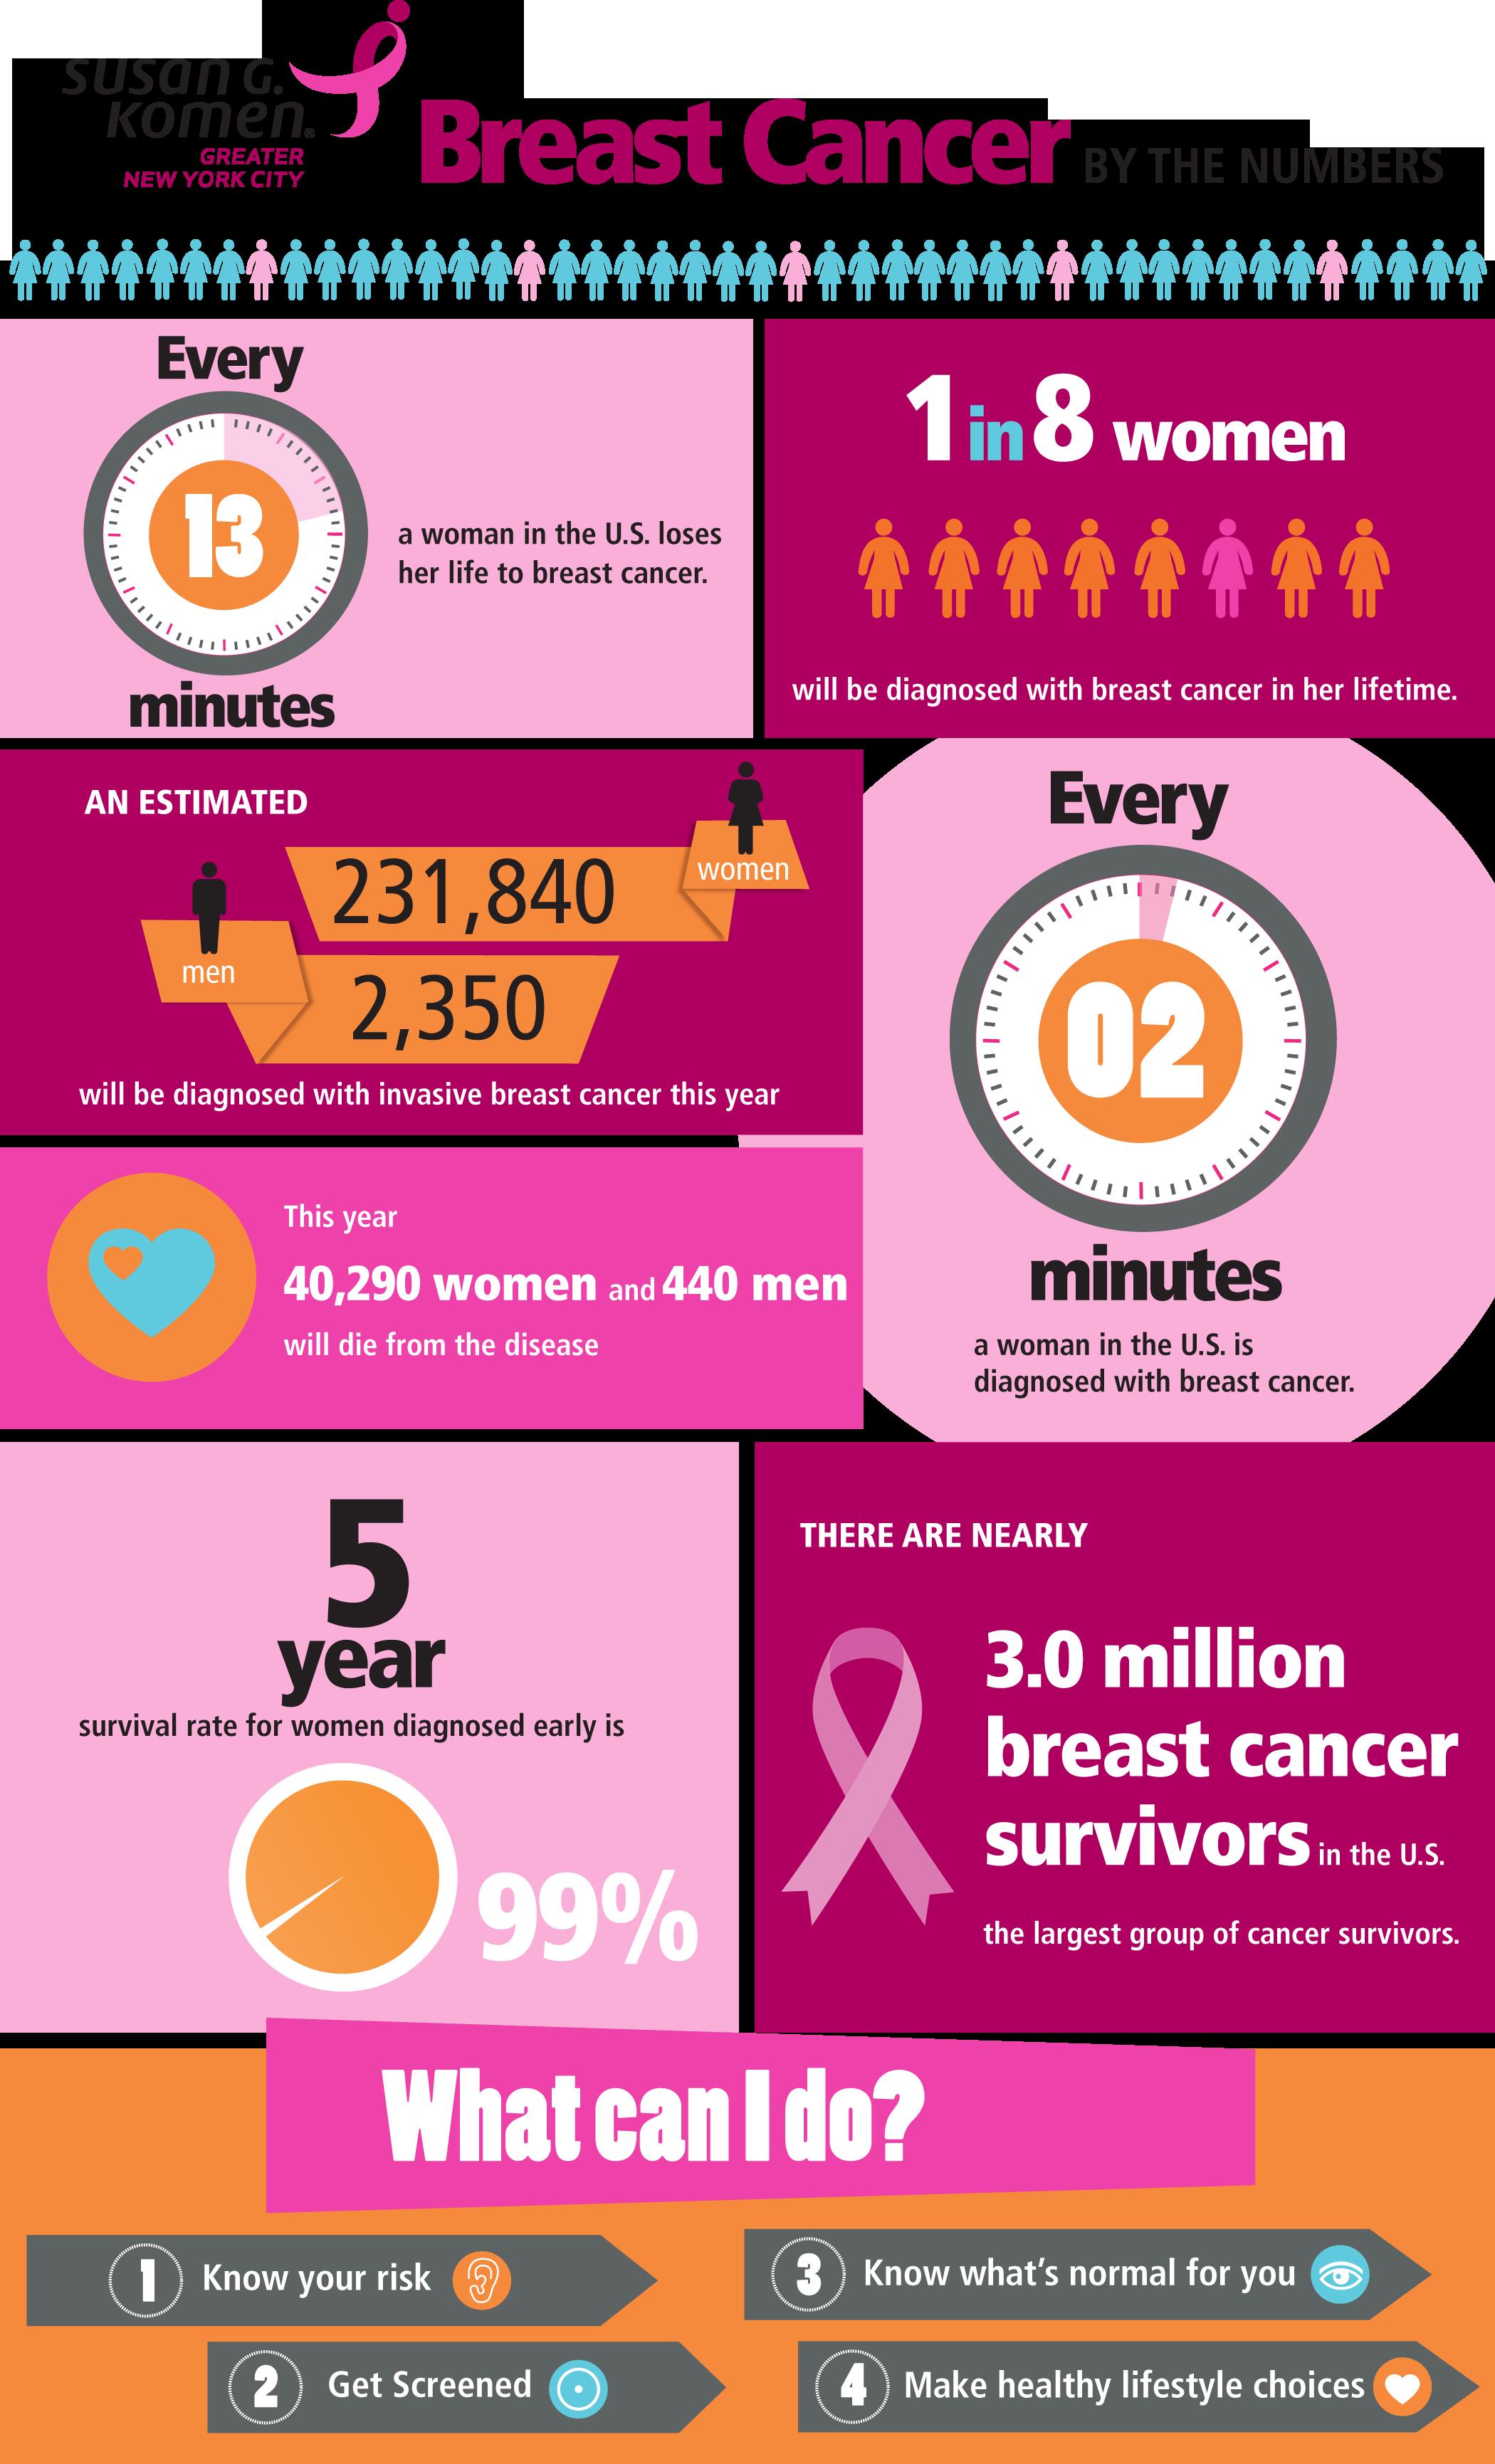 breast minnesota cancer komen g. Susan foundation